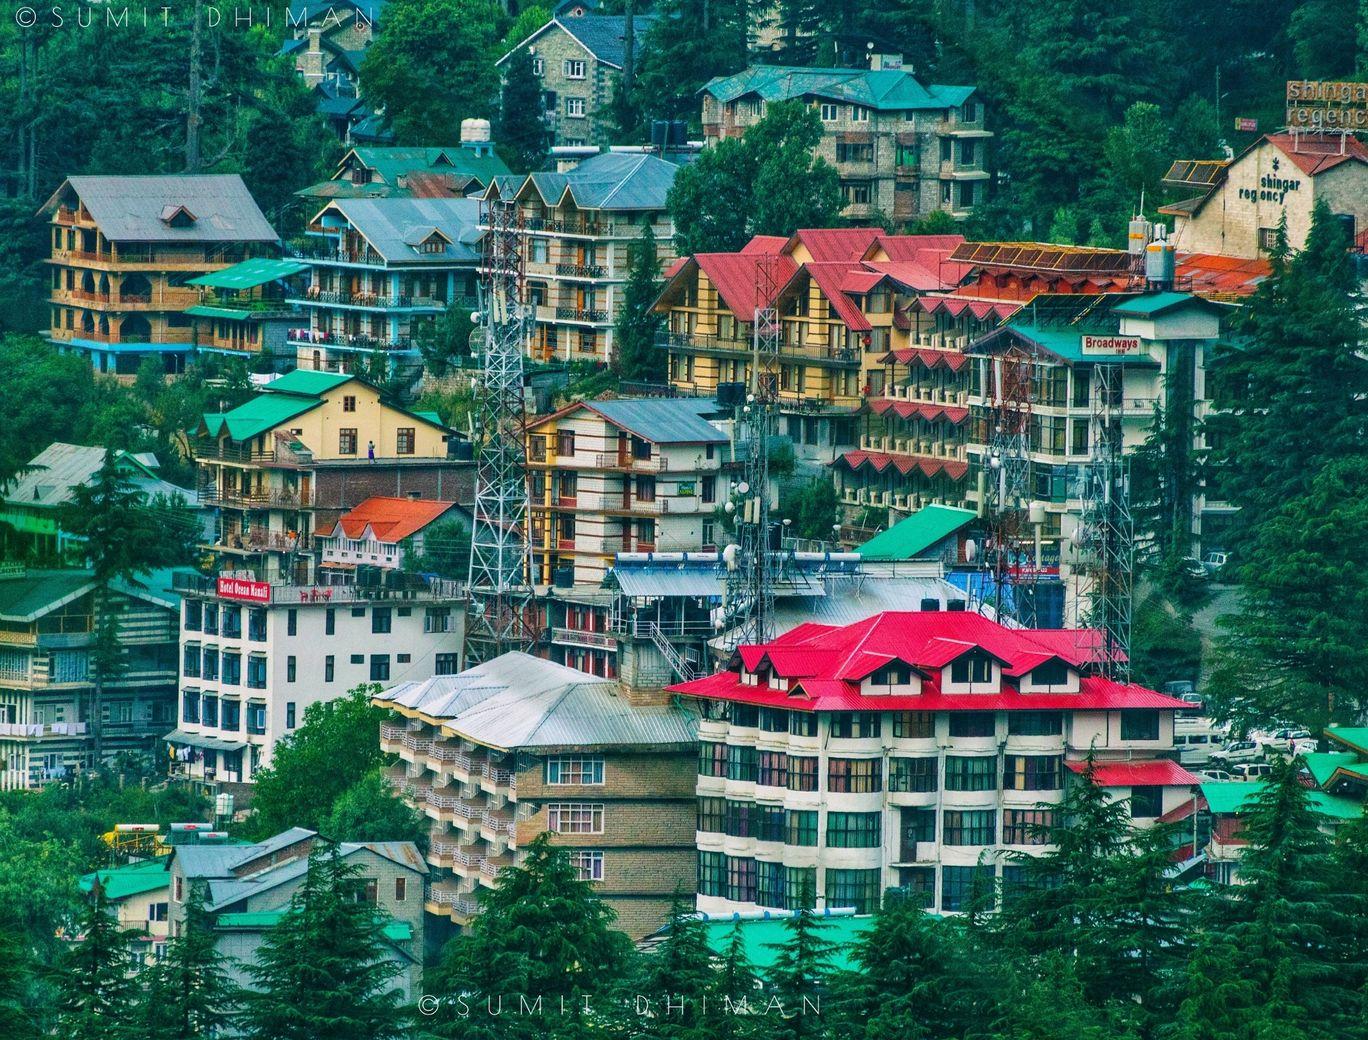 Photo of Himachal Pradesh By Sumit Dhiman